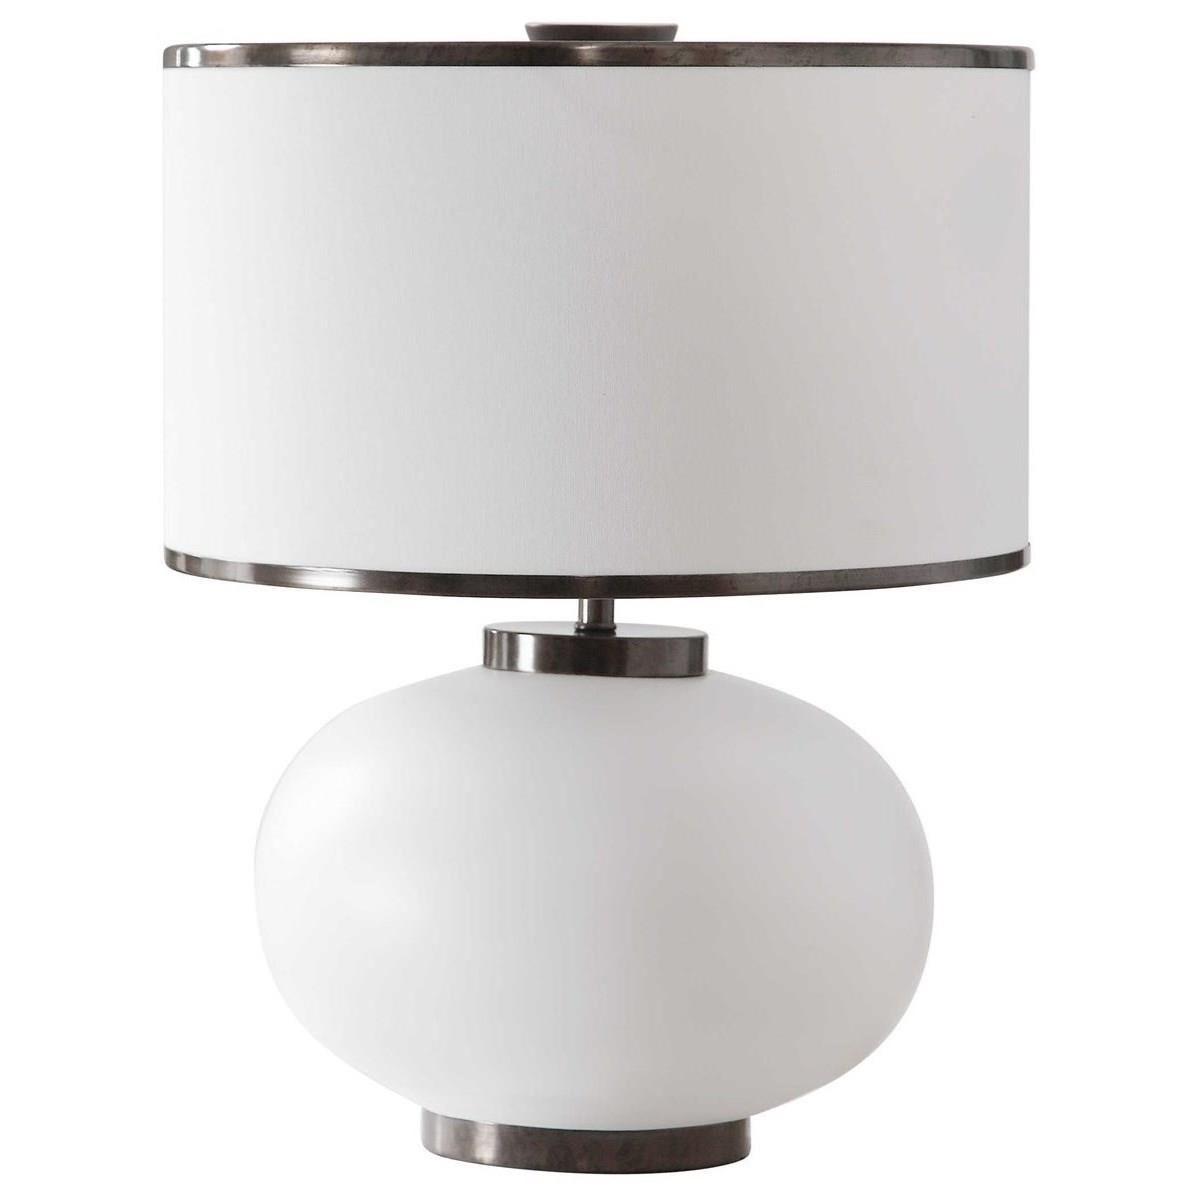 Rhiannon Modern Table Lamp